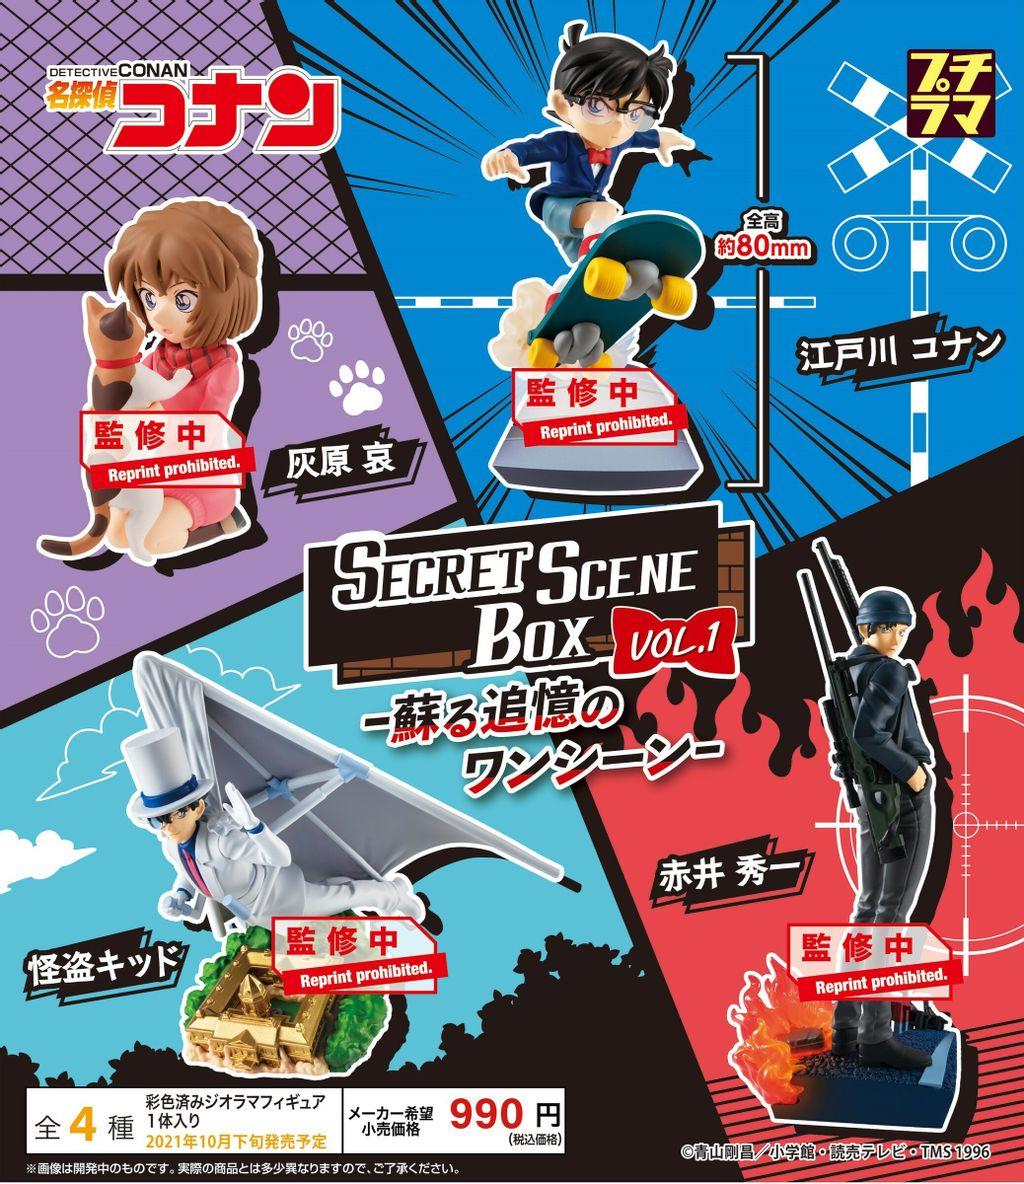 Petitrama Meitantei Conan SECRET SCENE BOX Vol.1 set.jpg